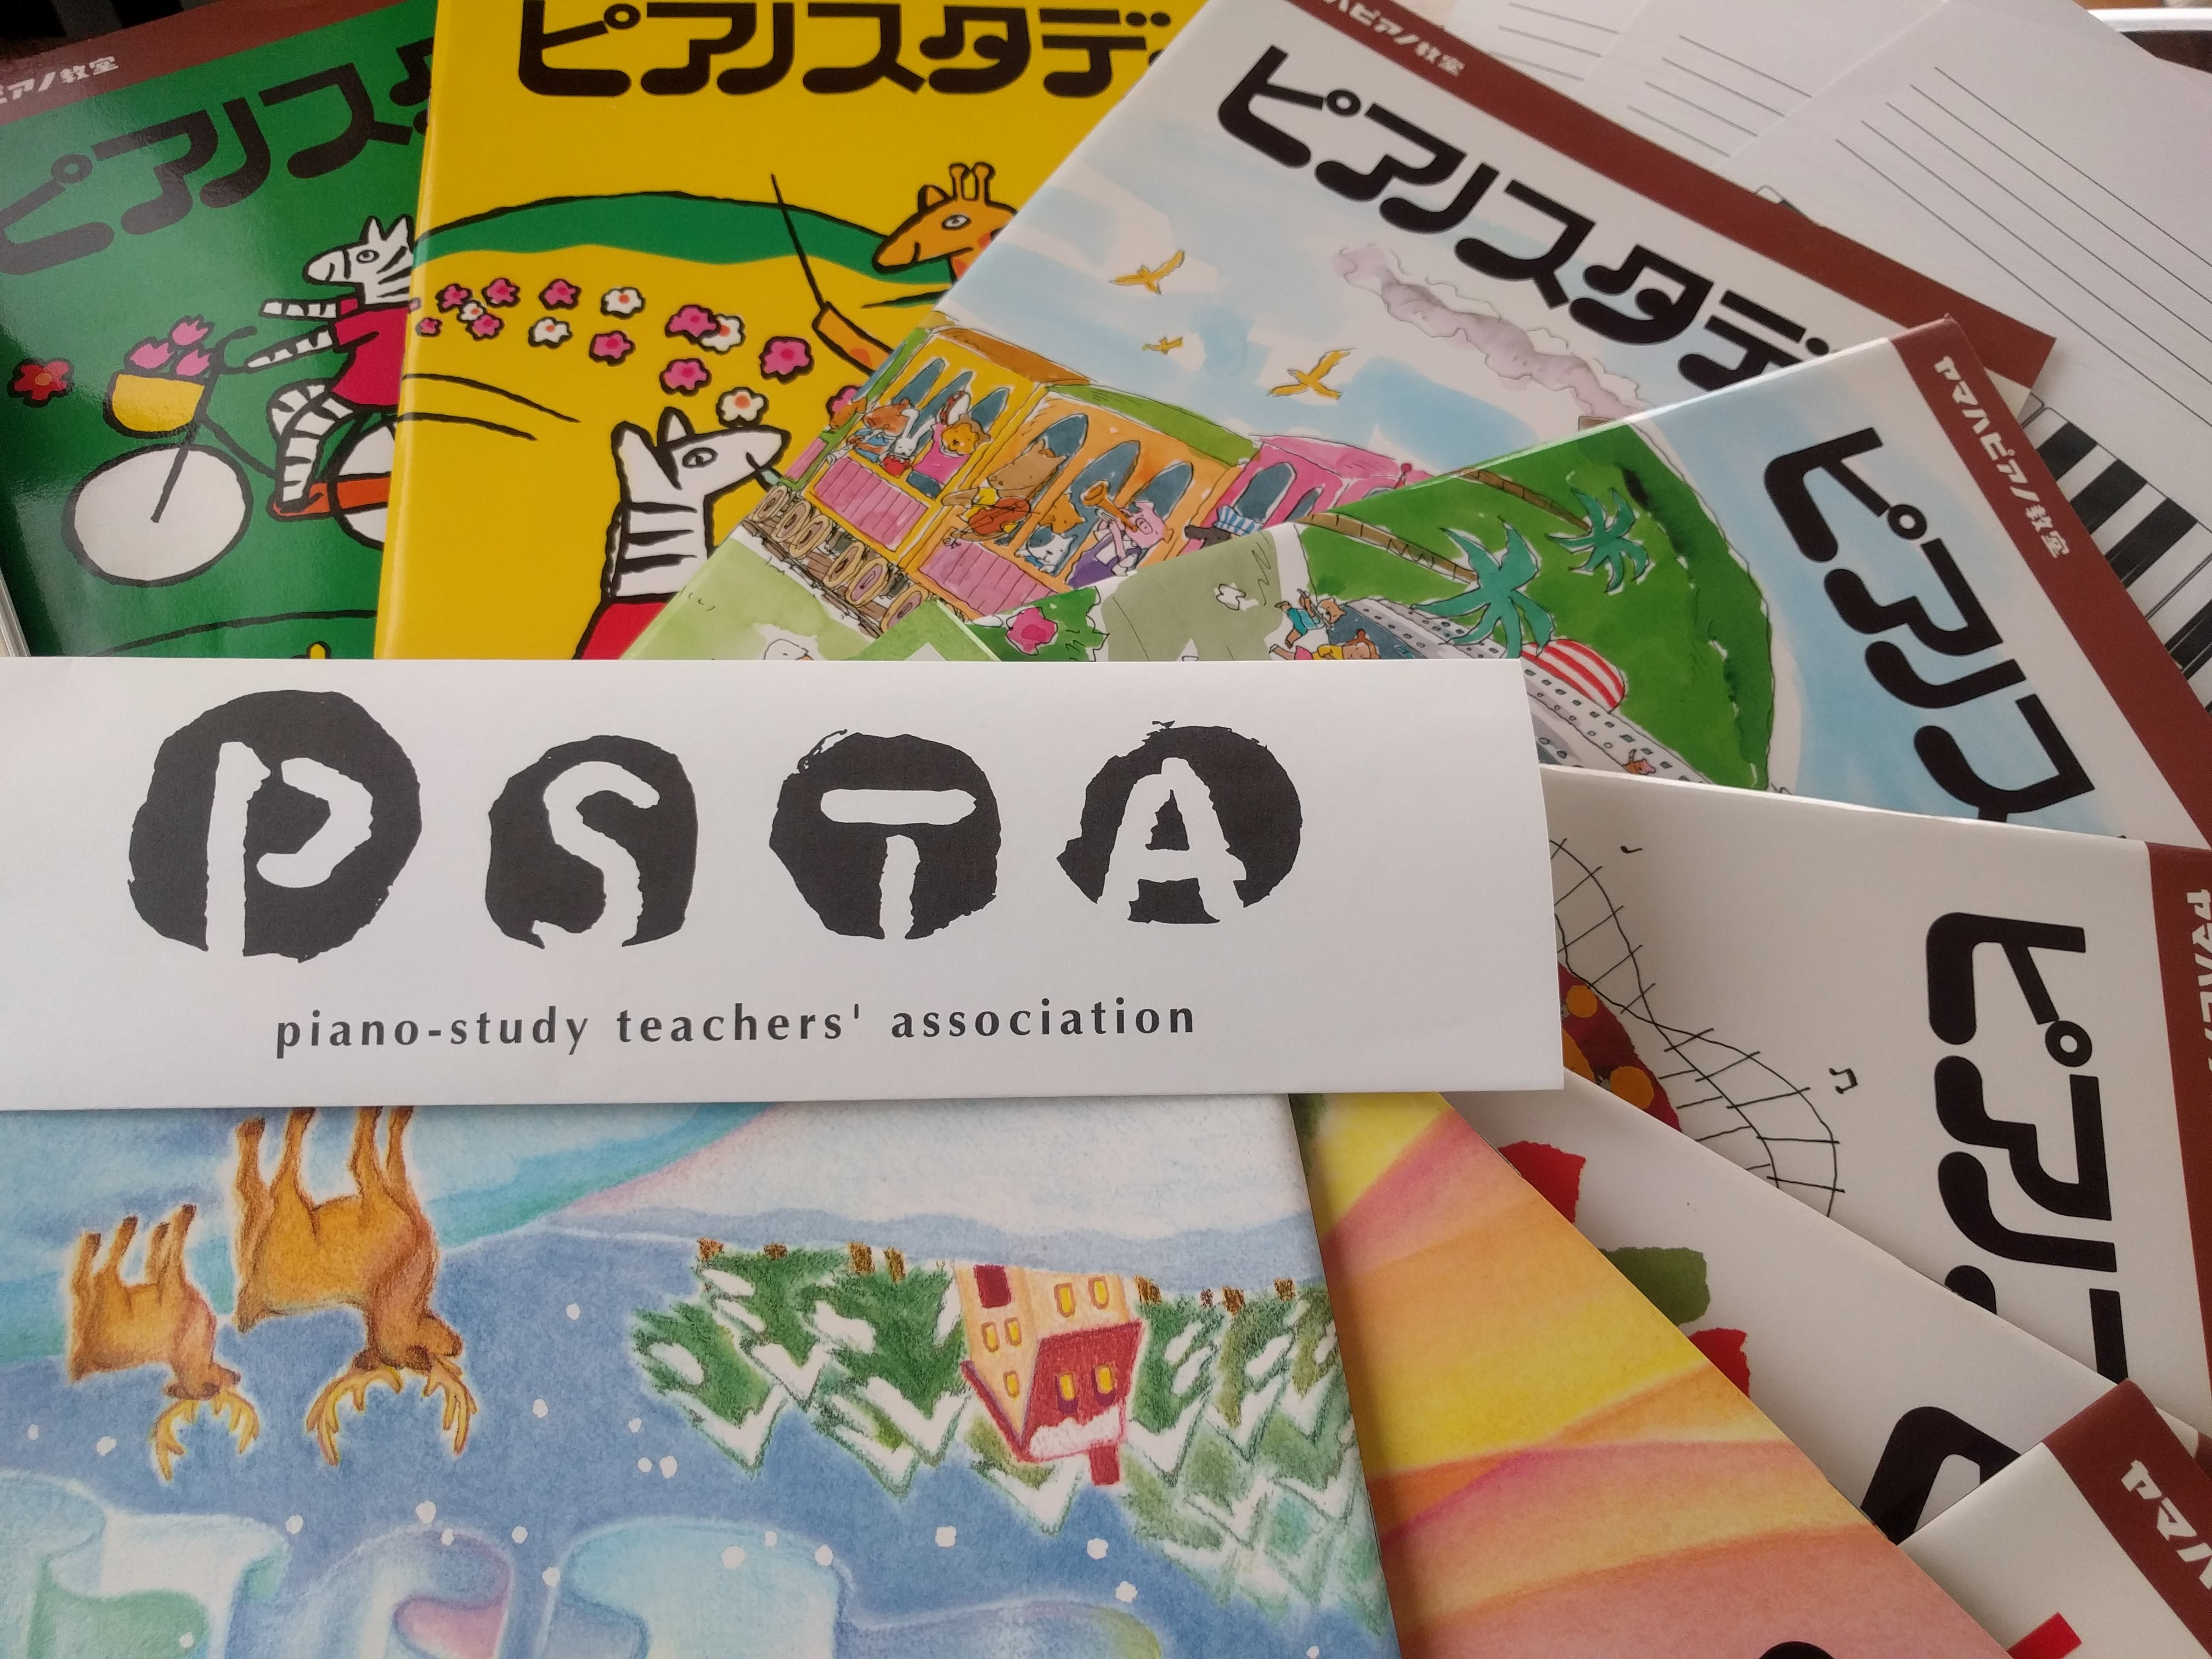 Maple音楽教室 ヤマハPSTA教材、カワイSound Tree教材、